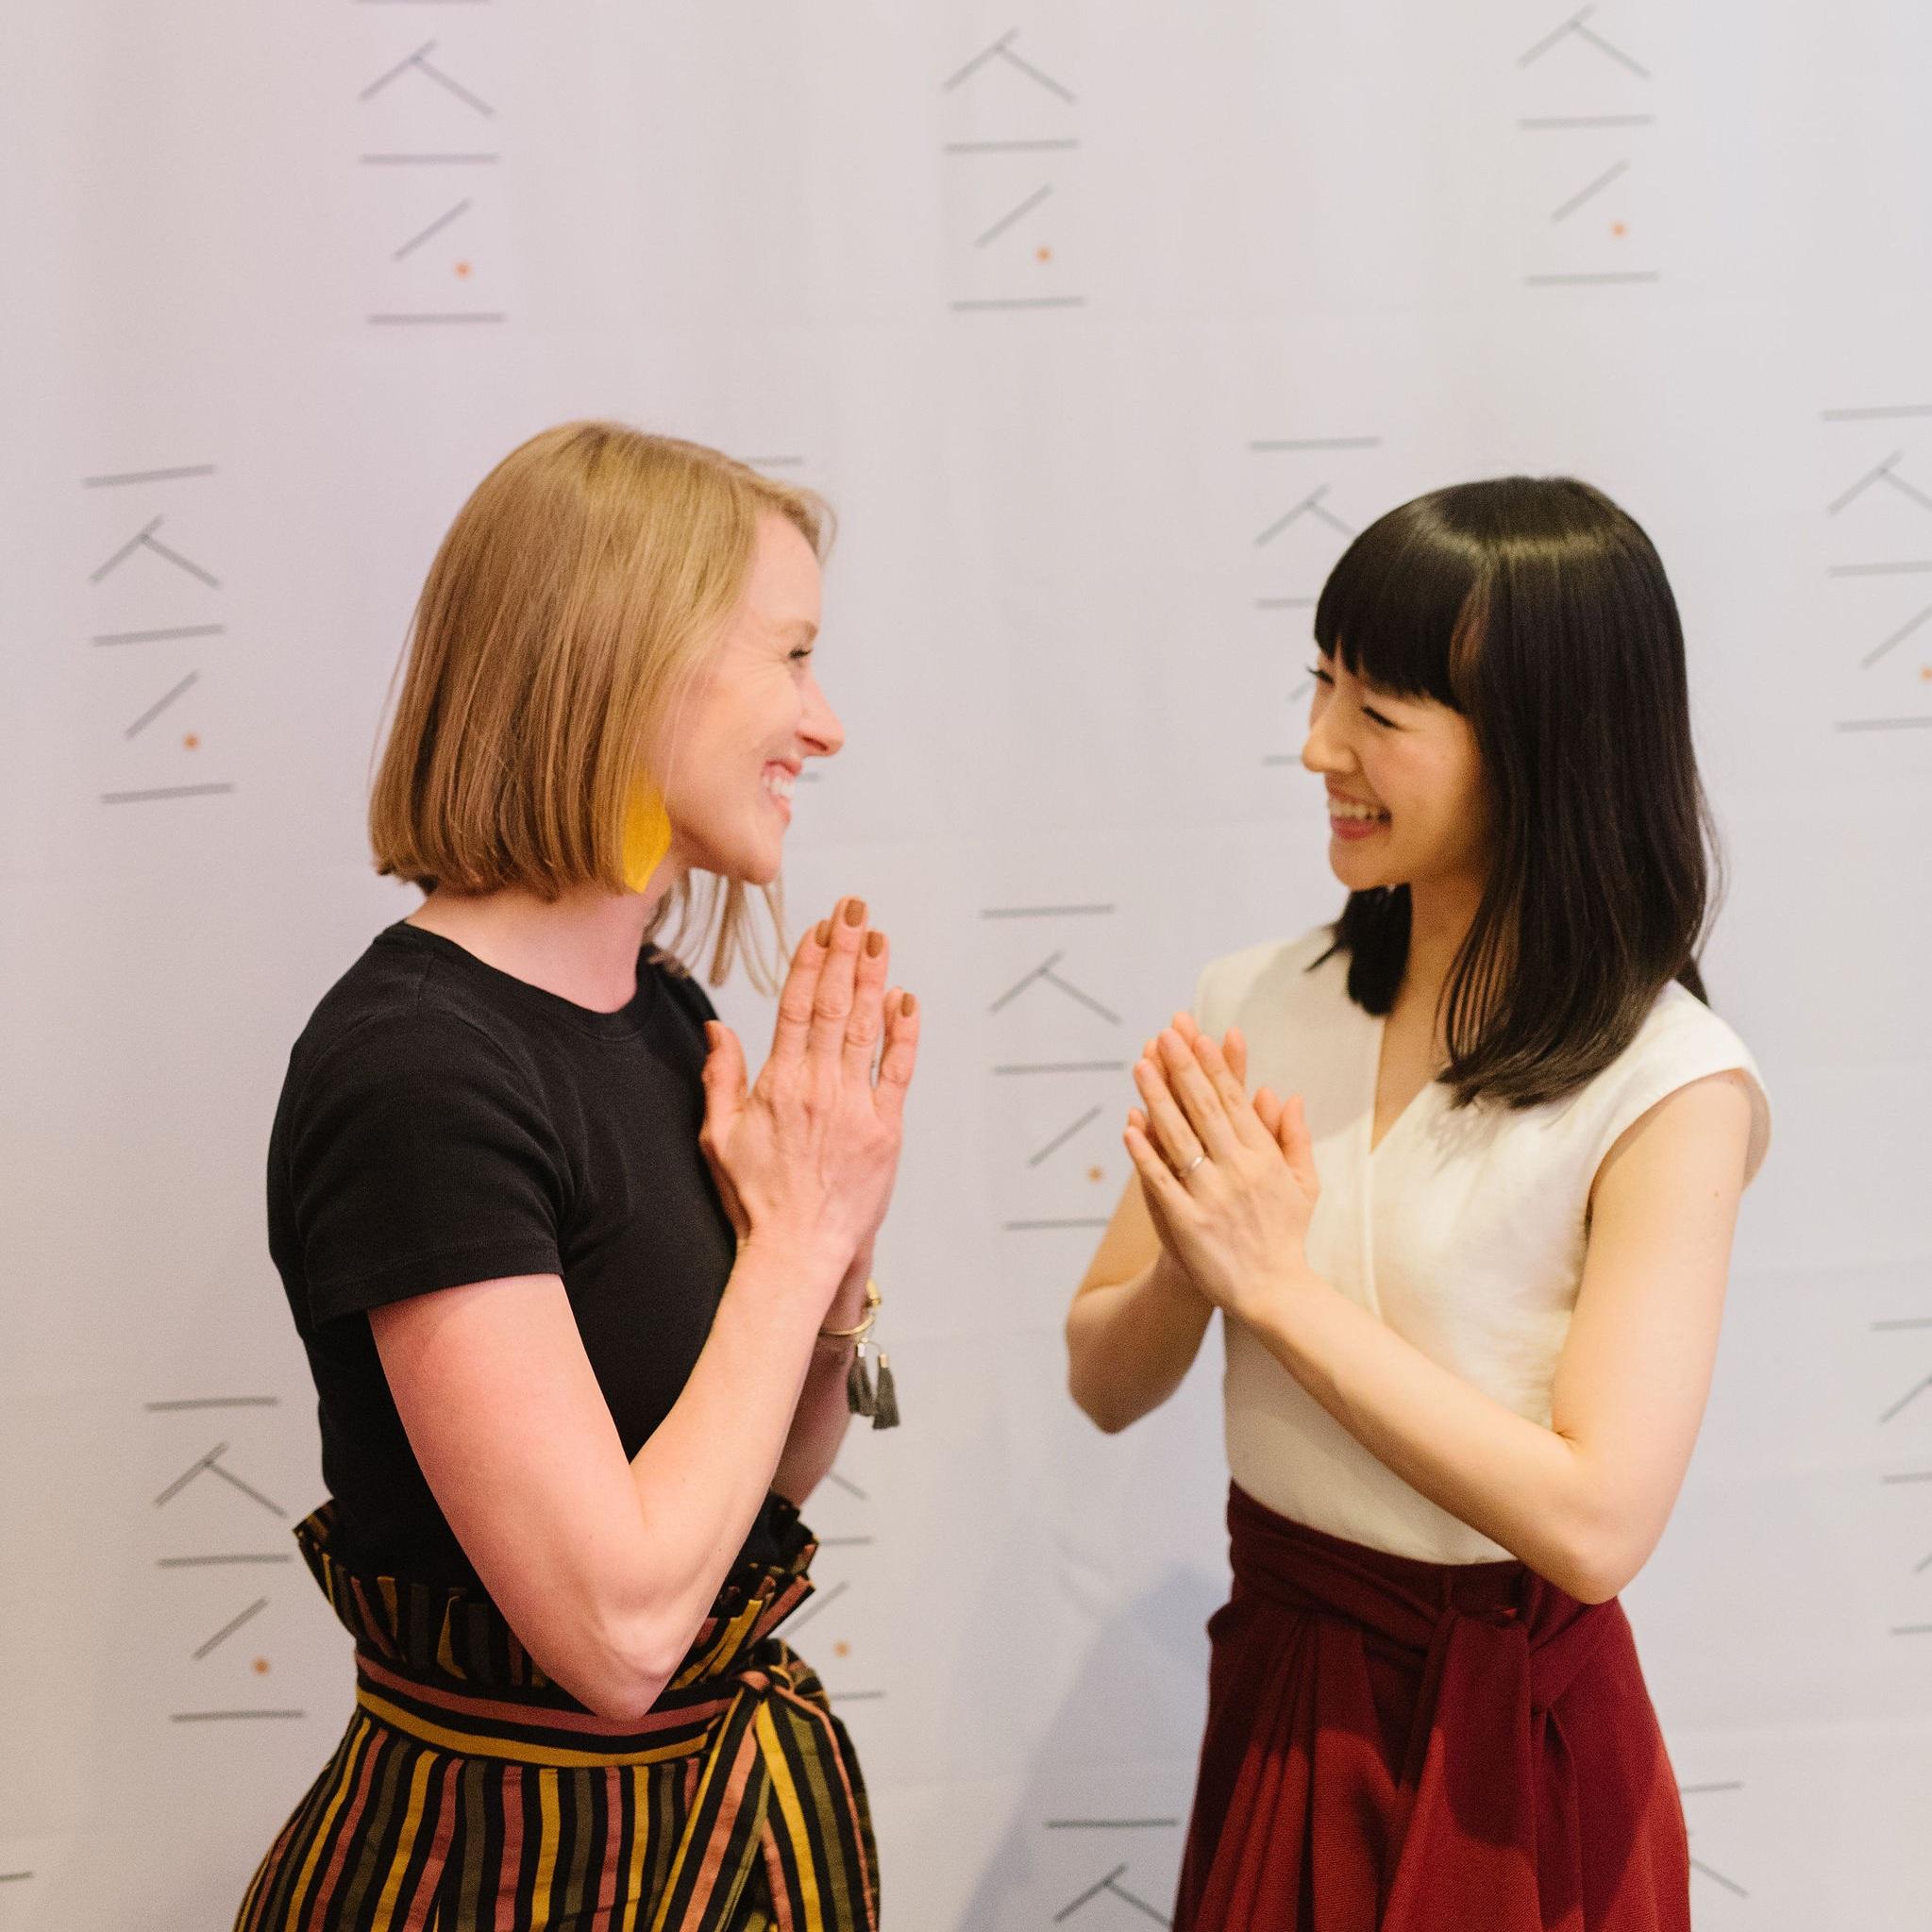 austin konmari consultant erin MURSCH with Marie Kondo